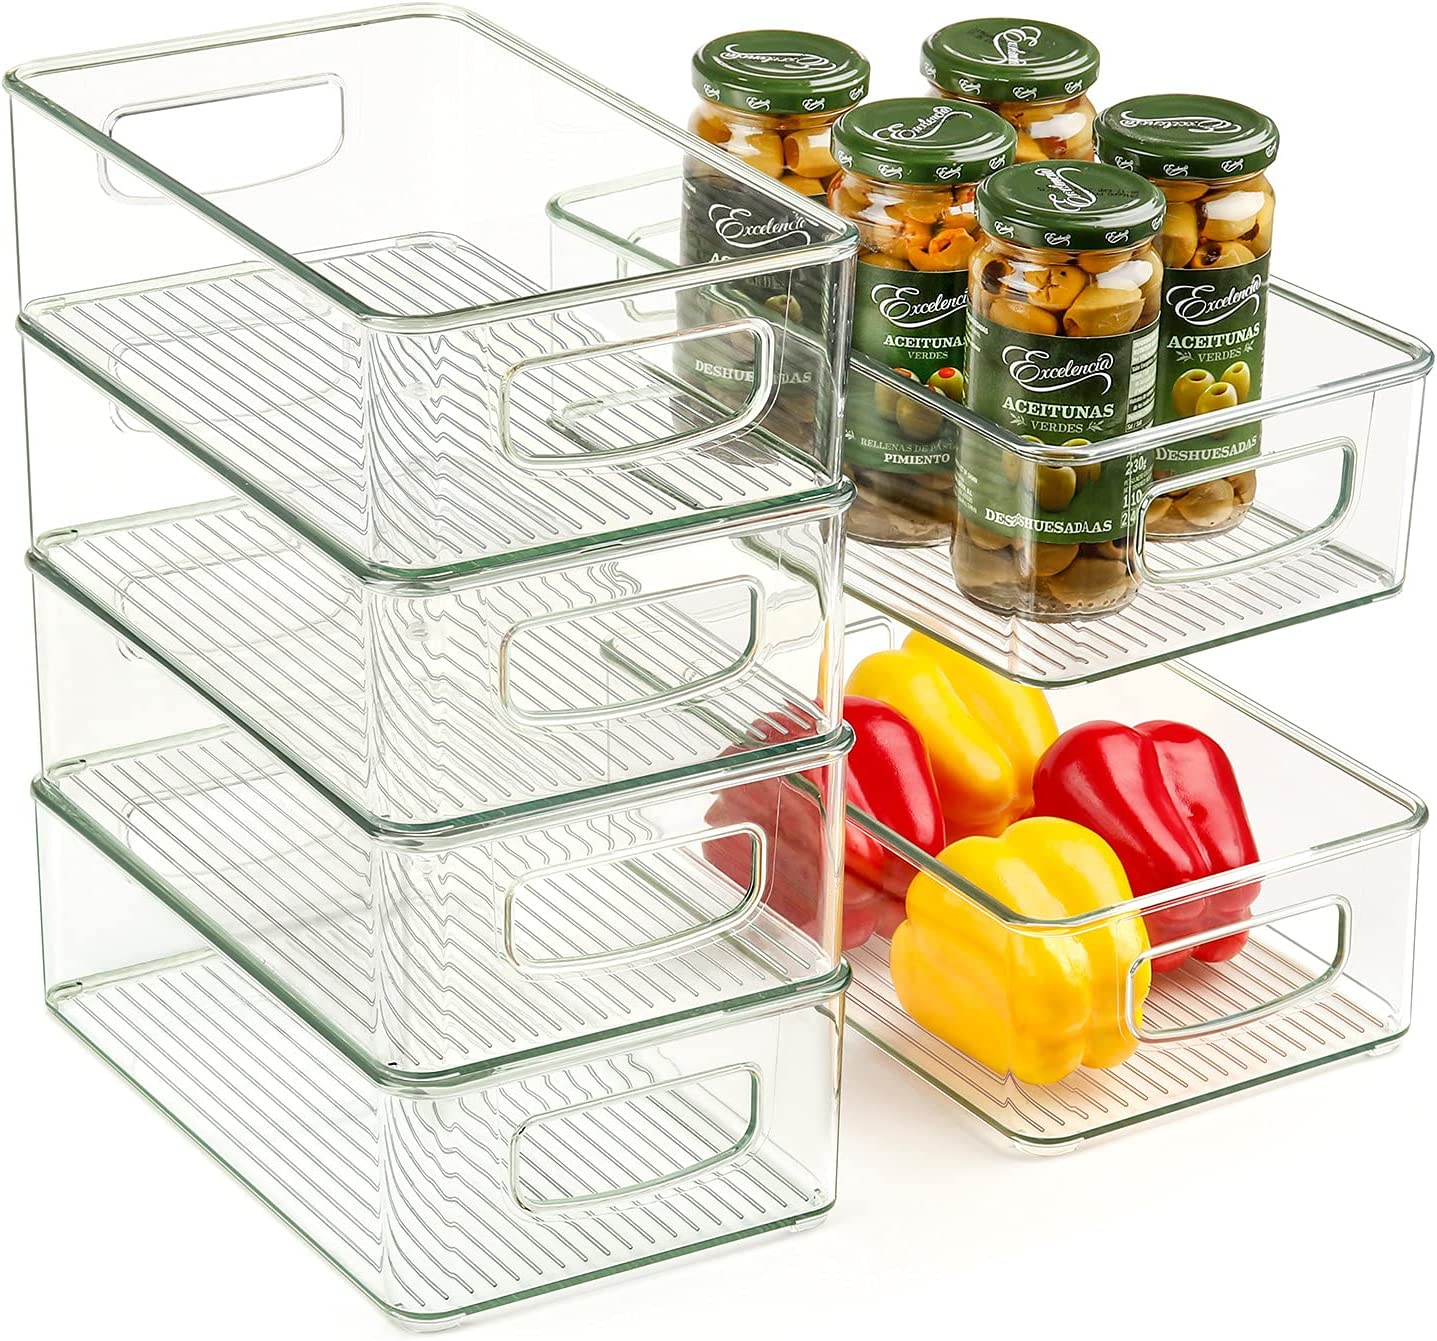 Set Of 6 Refrigerator Organizer Bins, Stackable Plastic Fridge Organizers with Handles for Freezer, Kitchen, Cabinet, Pantry Food Storage Rack, BPA Free, 10.2×6.2×3.2 inch